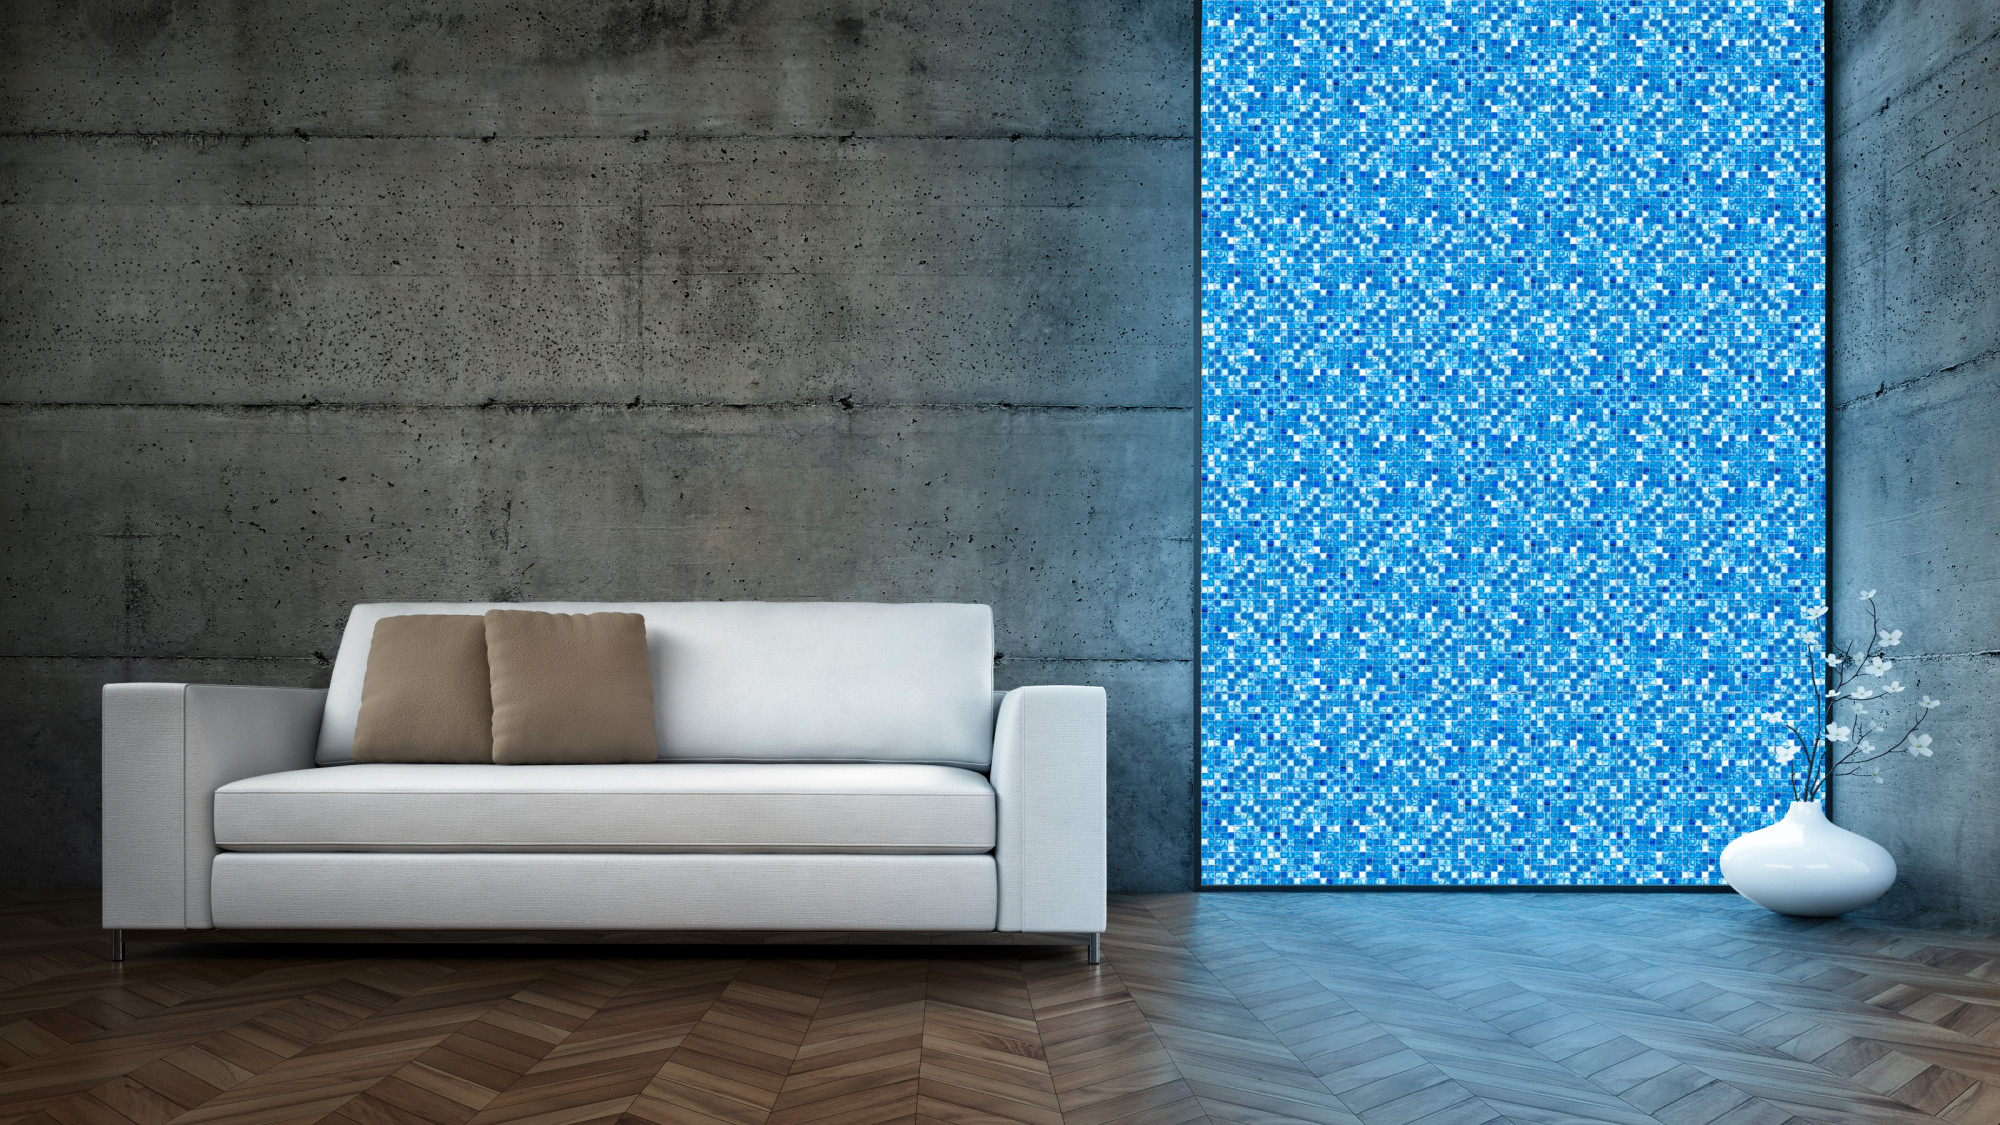 Vernetztes, leuchtendes Glasmosaik | Elektro | News/Produkte ...